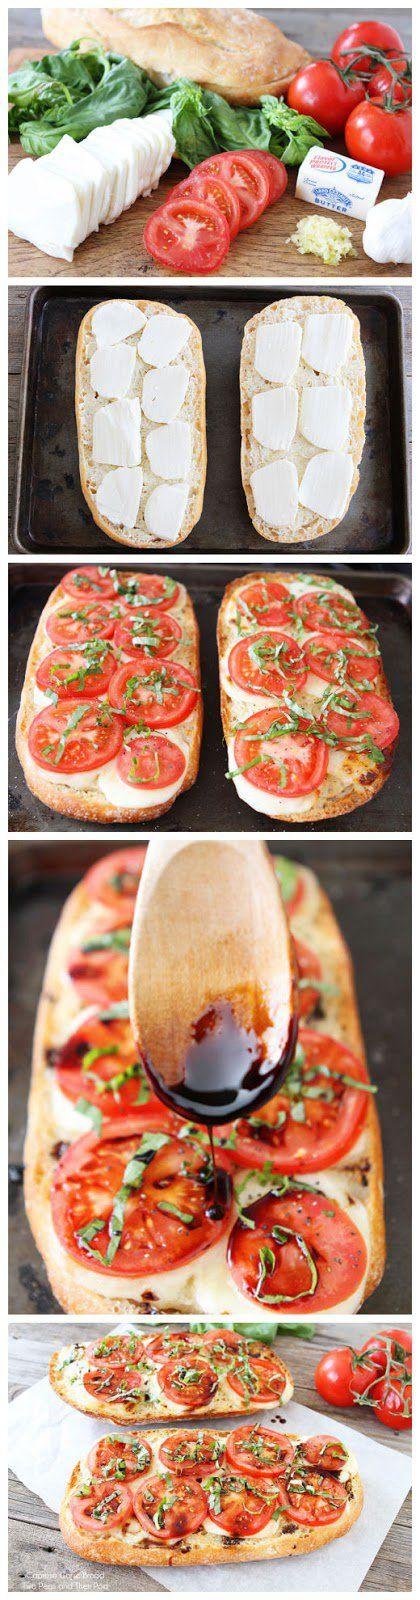 Caprese Garlic Bread Recipe   Two Peas & Their Pod. A simple recipe for Caprese Garlic Bread, the best garlic bread you will ever eat! #vegetarian #tomato #basil #mozarella #cheese #caprese #garlic #bread #italian #food #appetizer #openfaced #sandwich #recipe